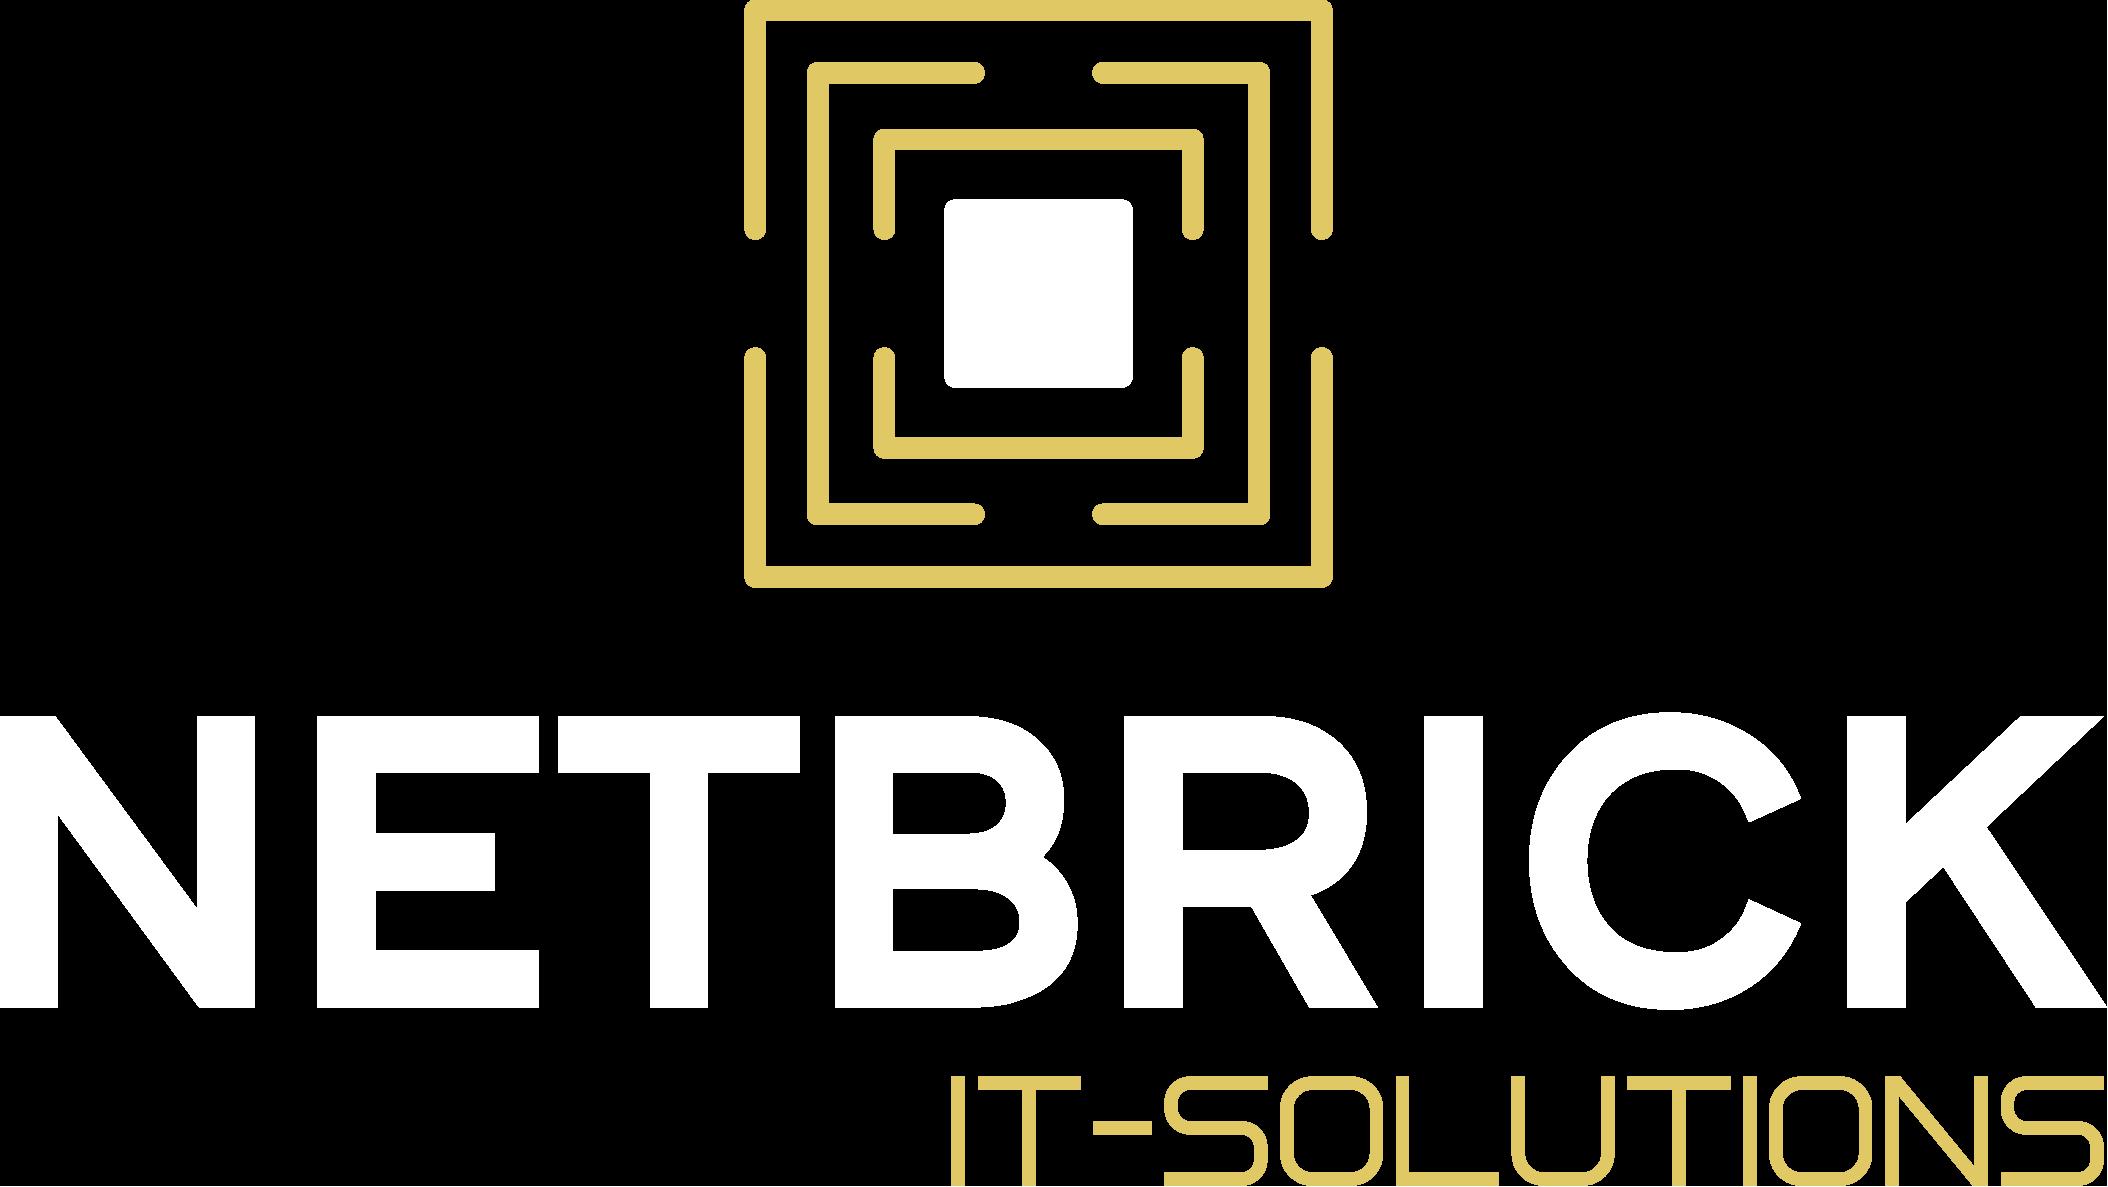 NetBrick - IT Solutions